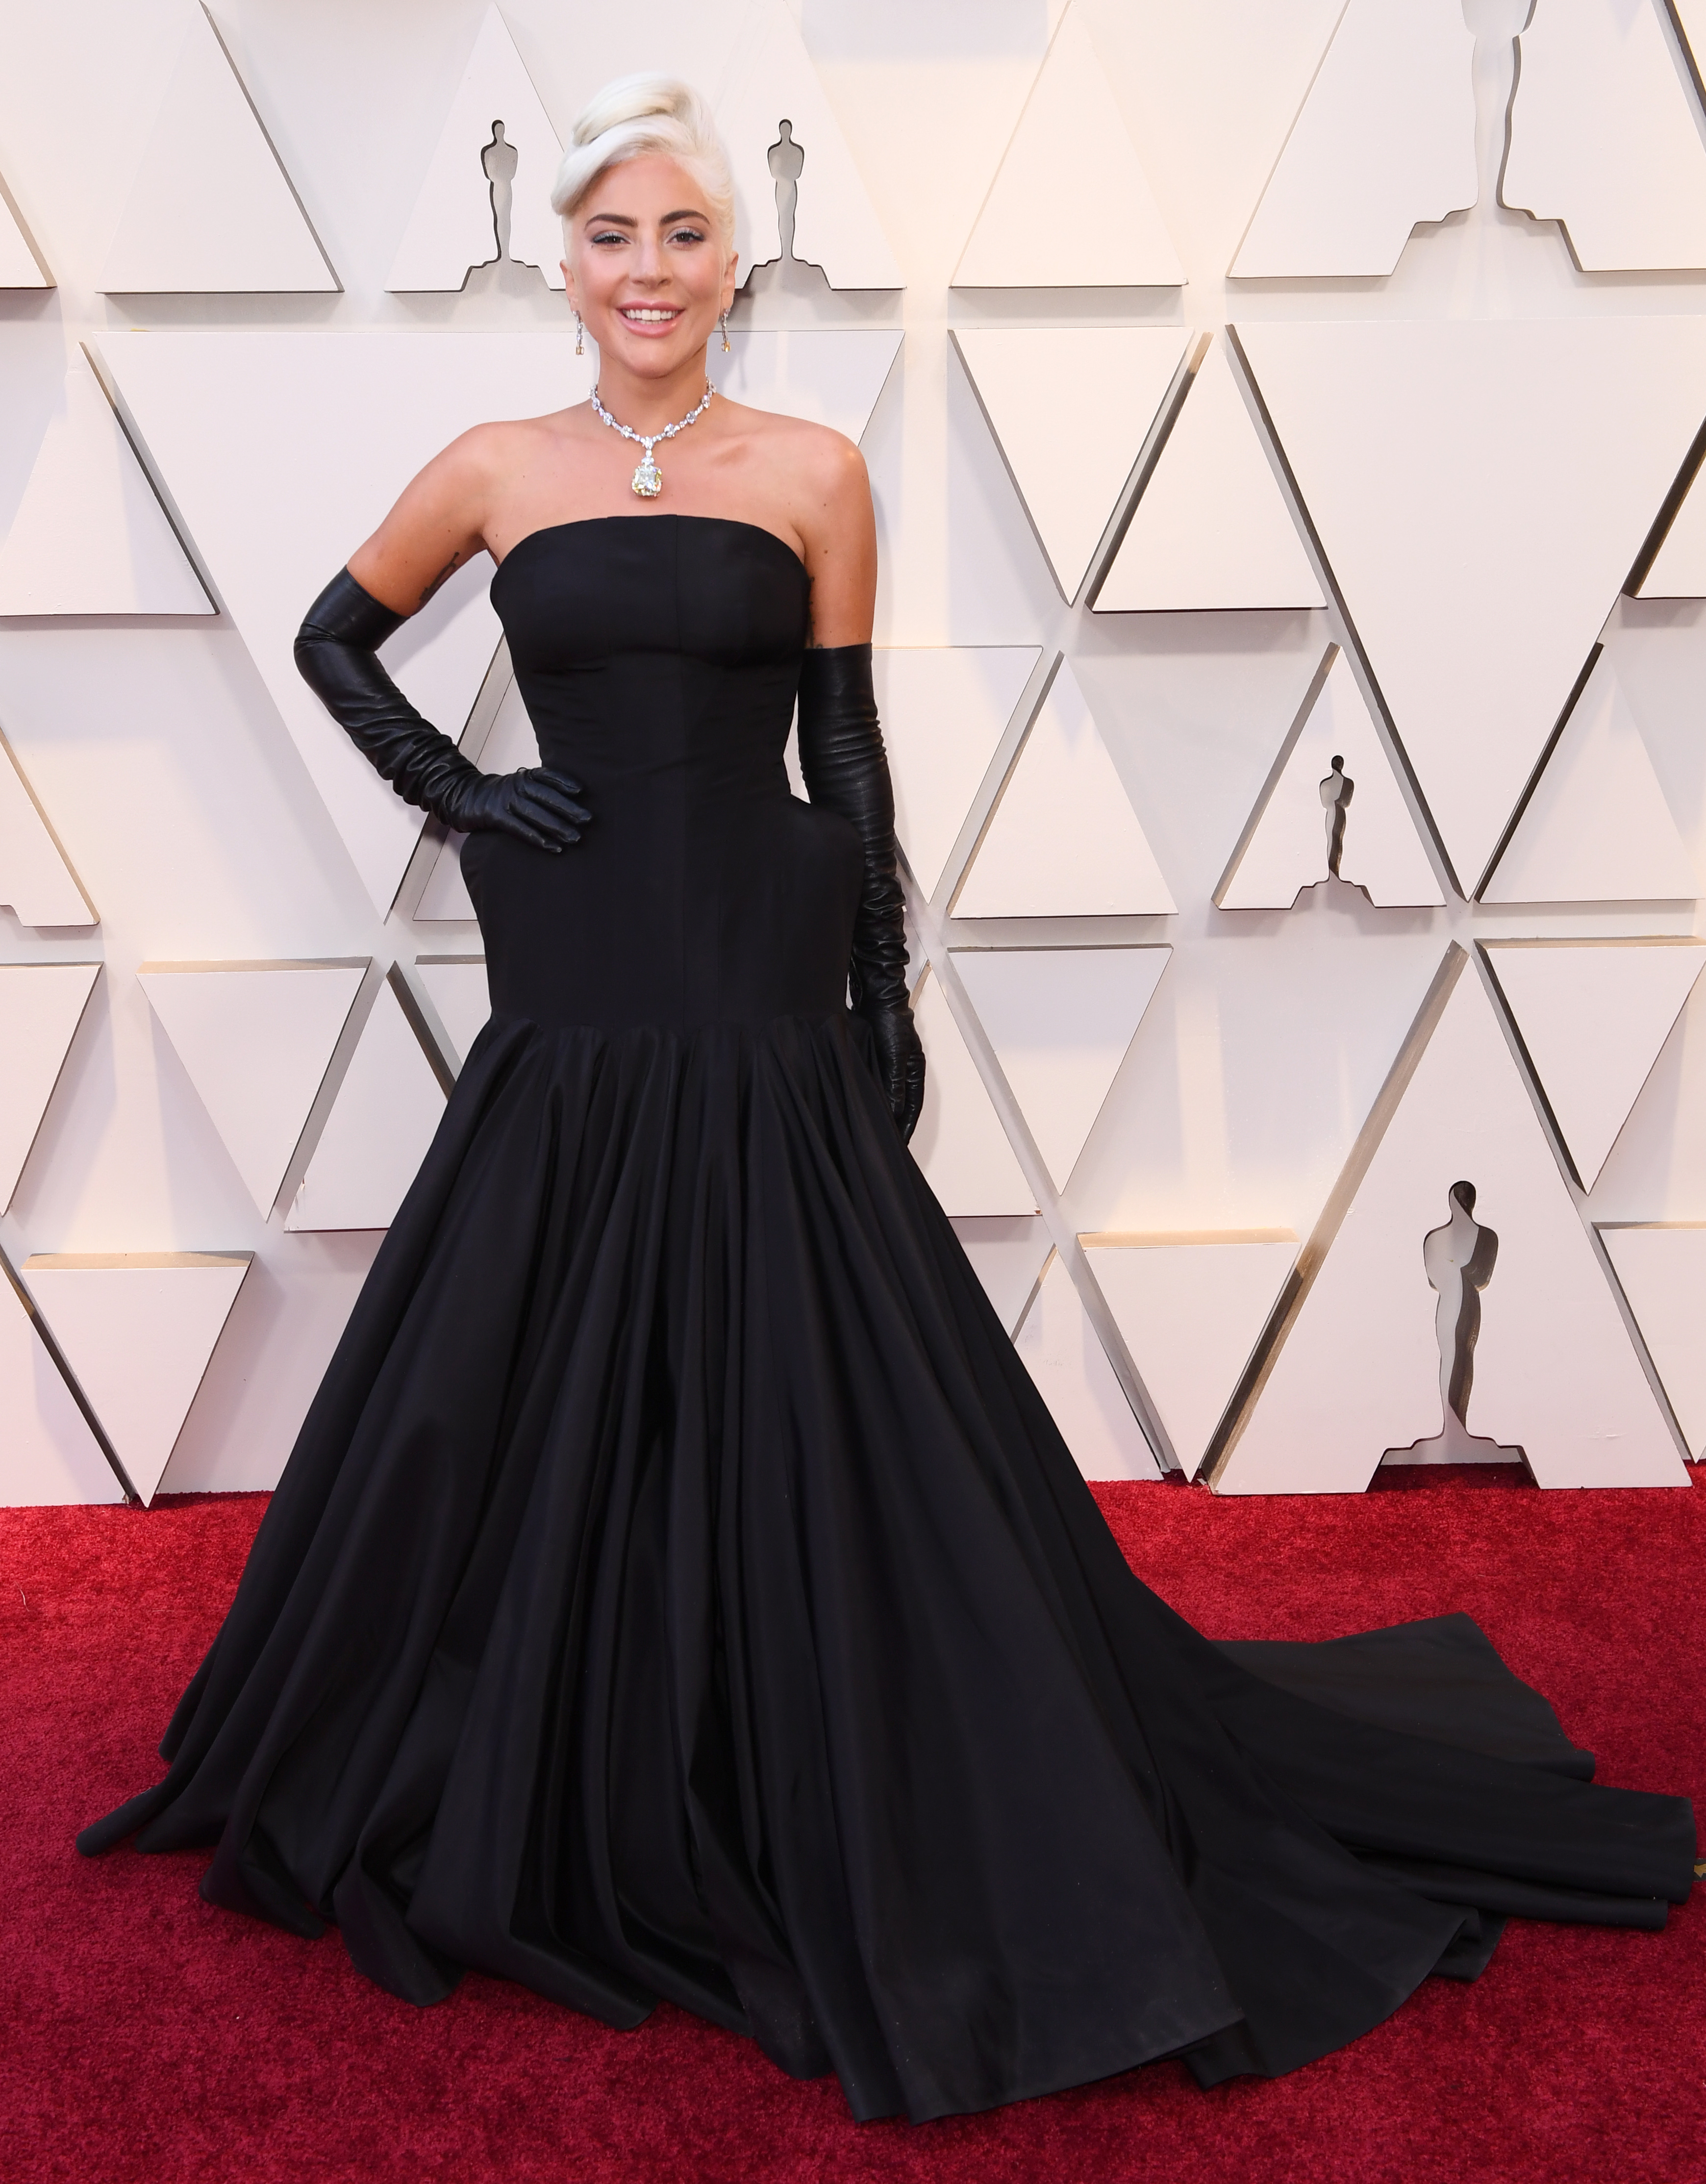 Lady Gaga in Alexander McQueen, 2019 Oscars